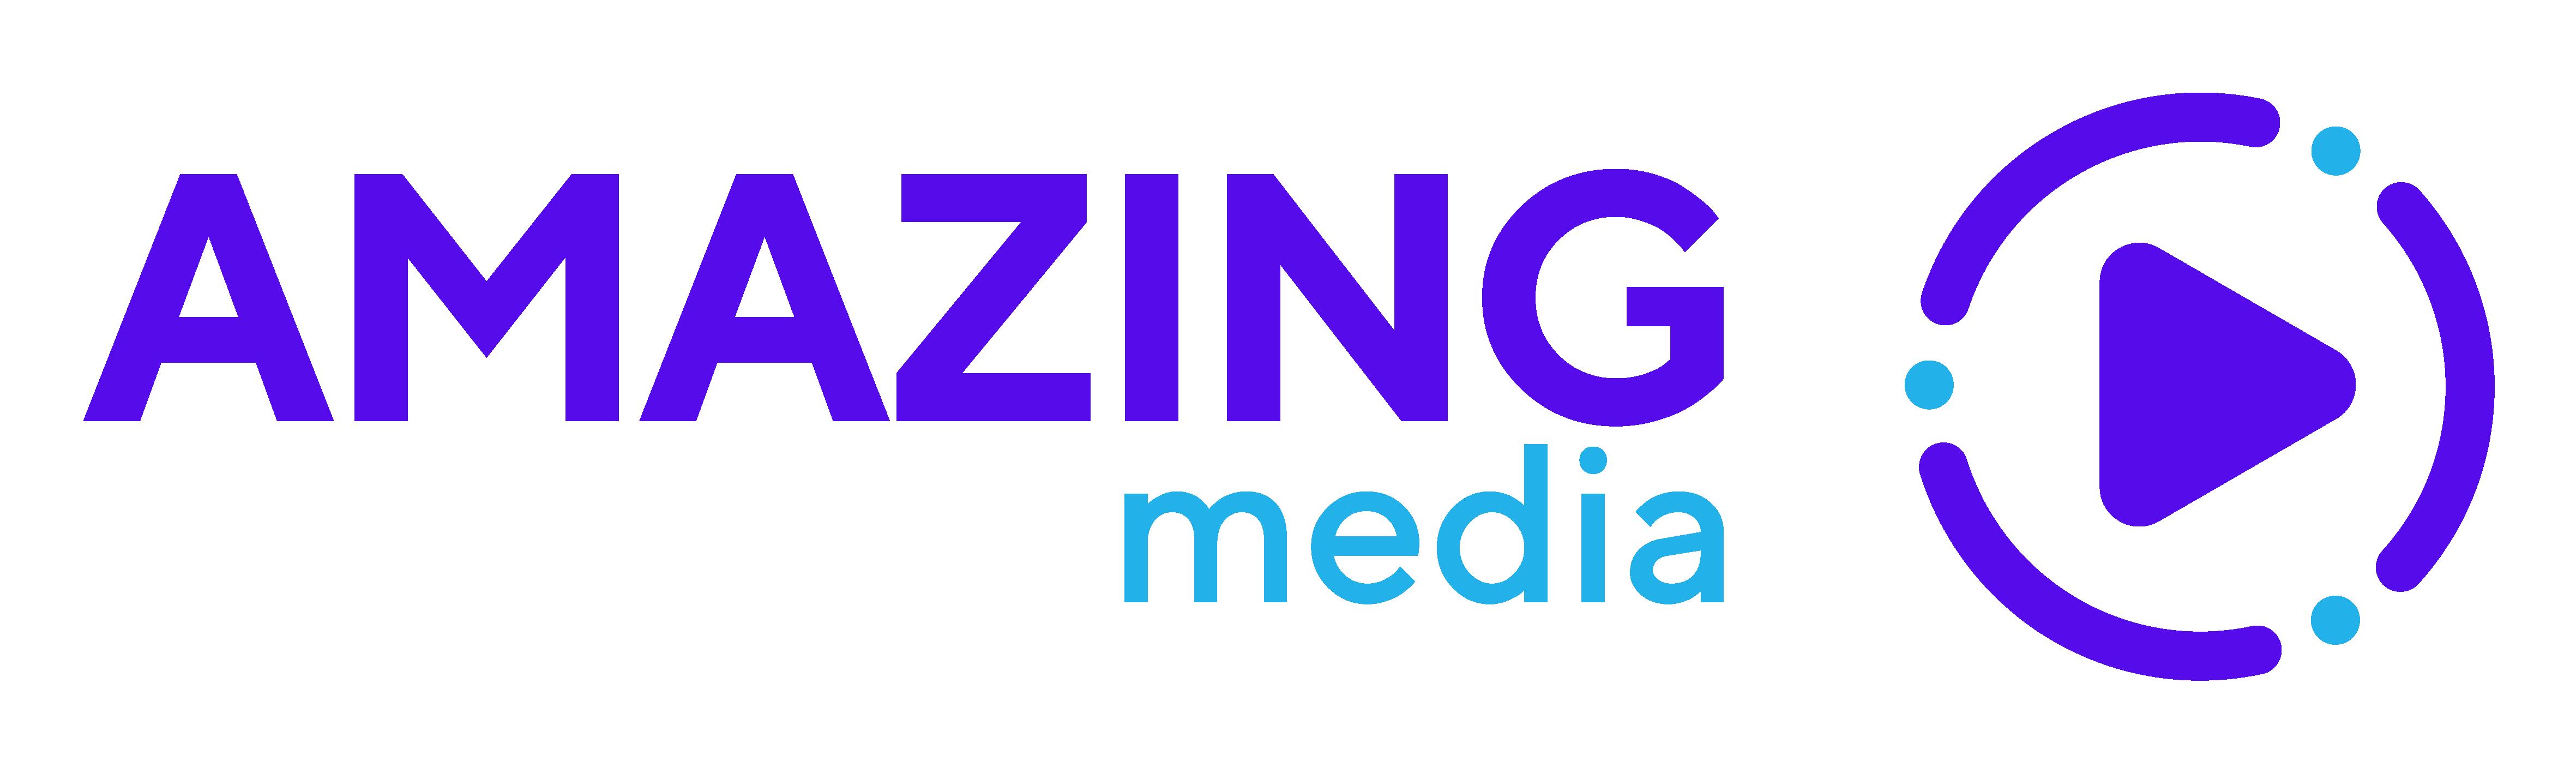 Amazing Media logo